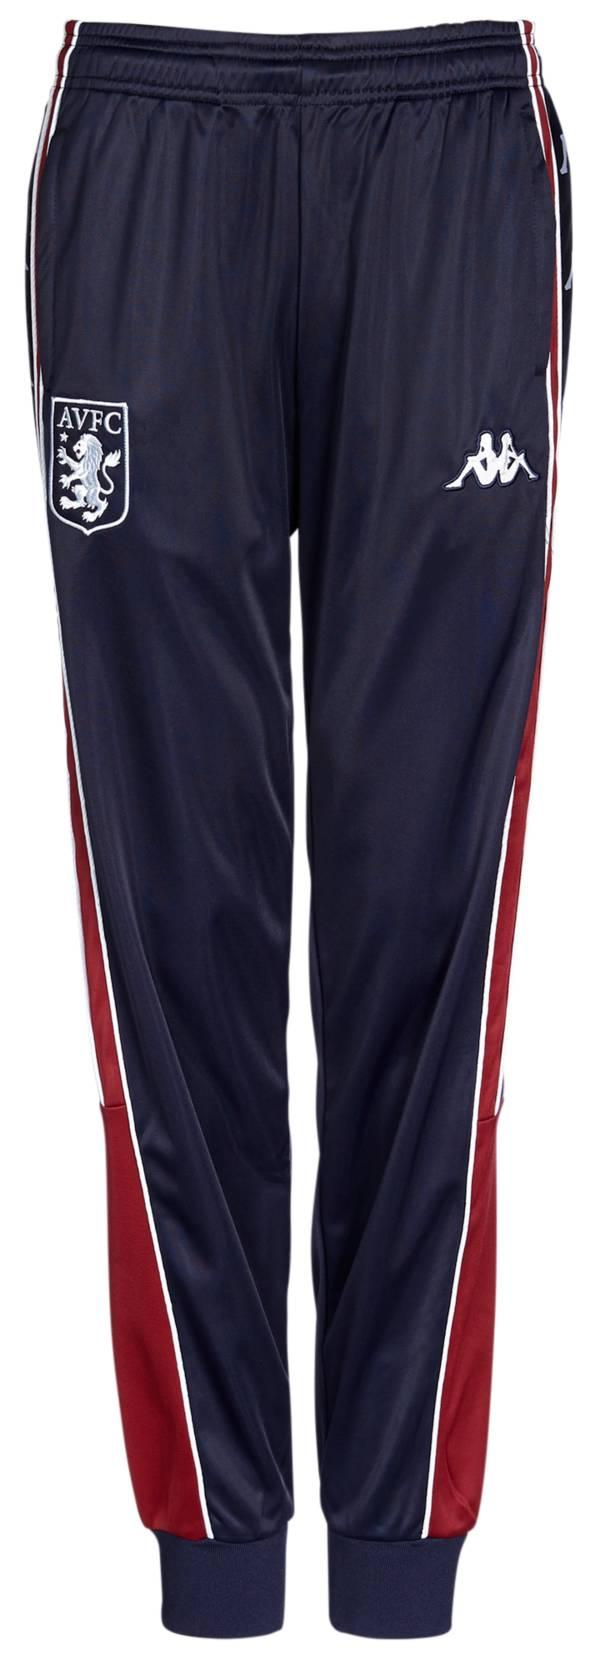 Kappa Men's Aston Villa Retro Navy Pants product image